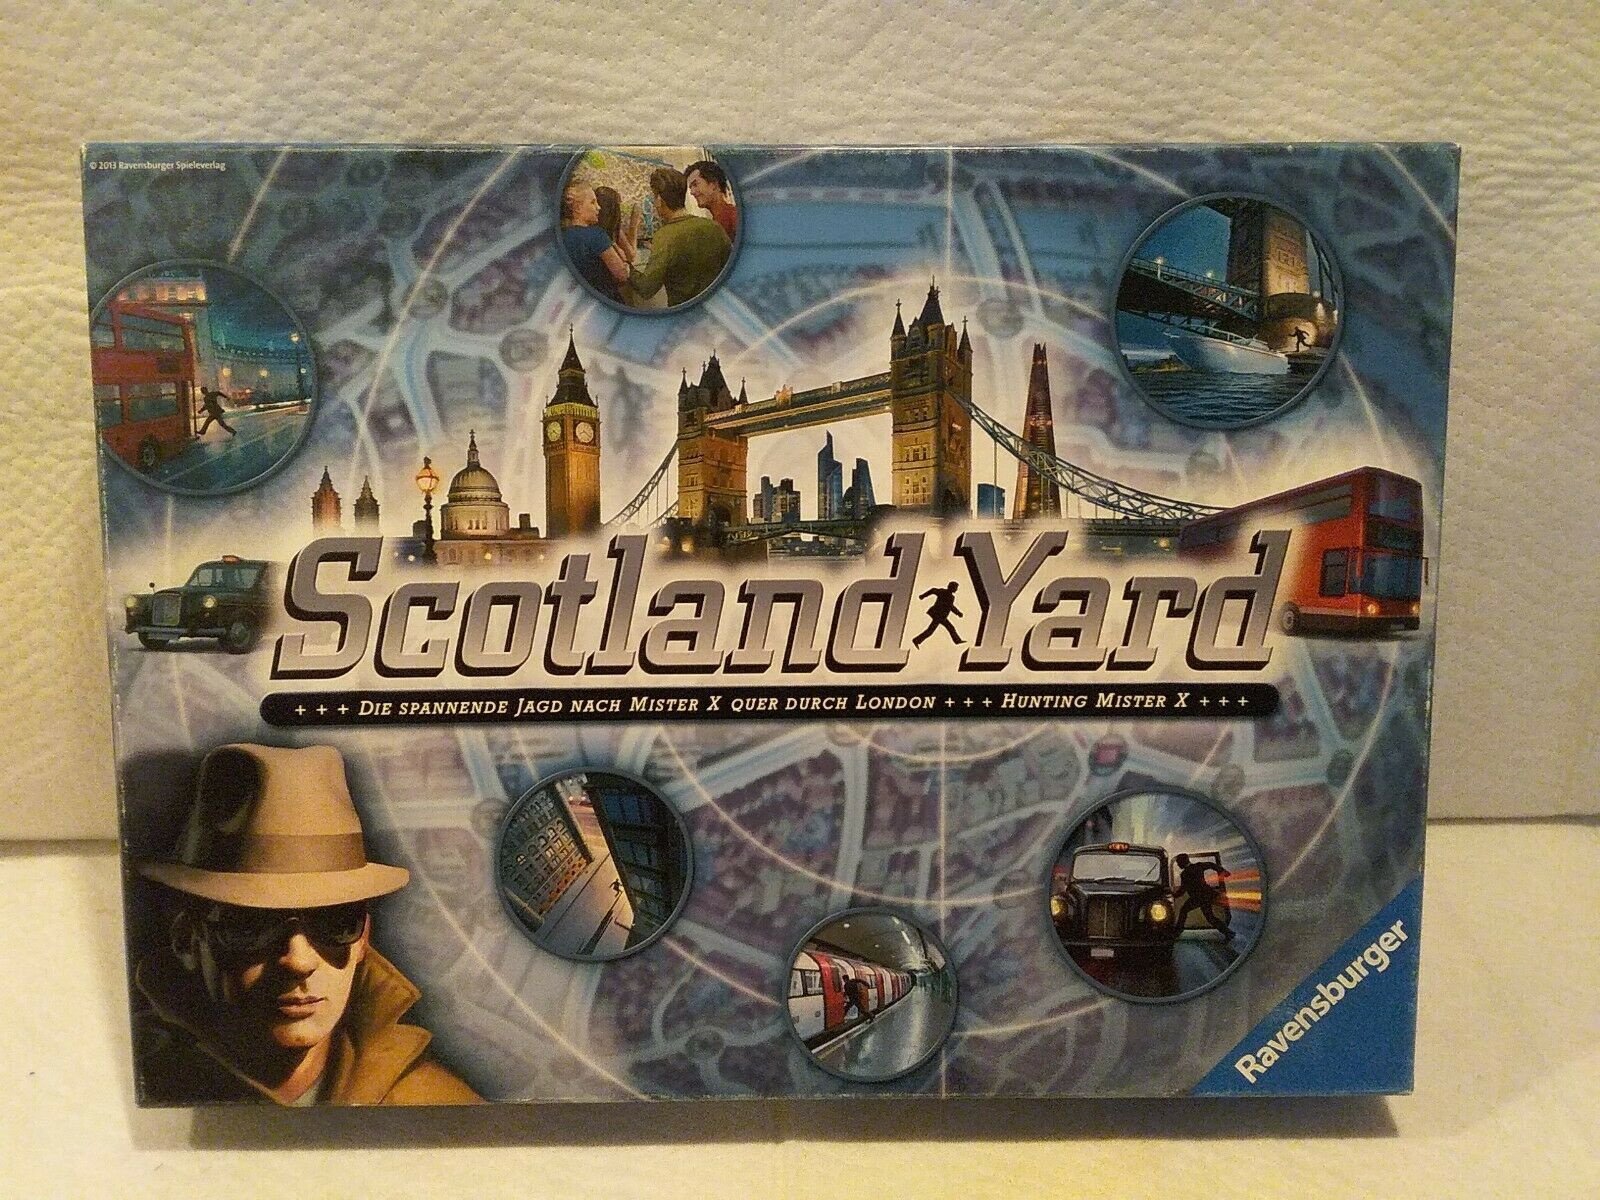 Genuine Game Parts Ravensburger 2016 Scotland Yard Junior